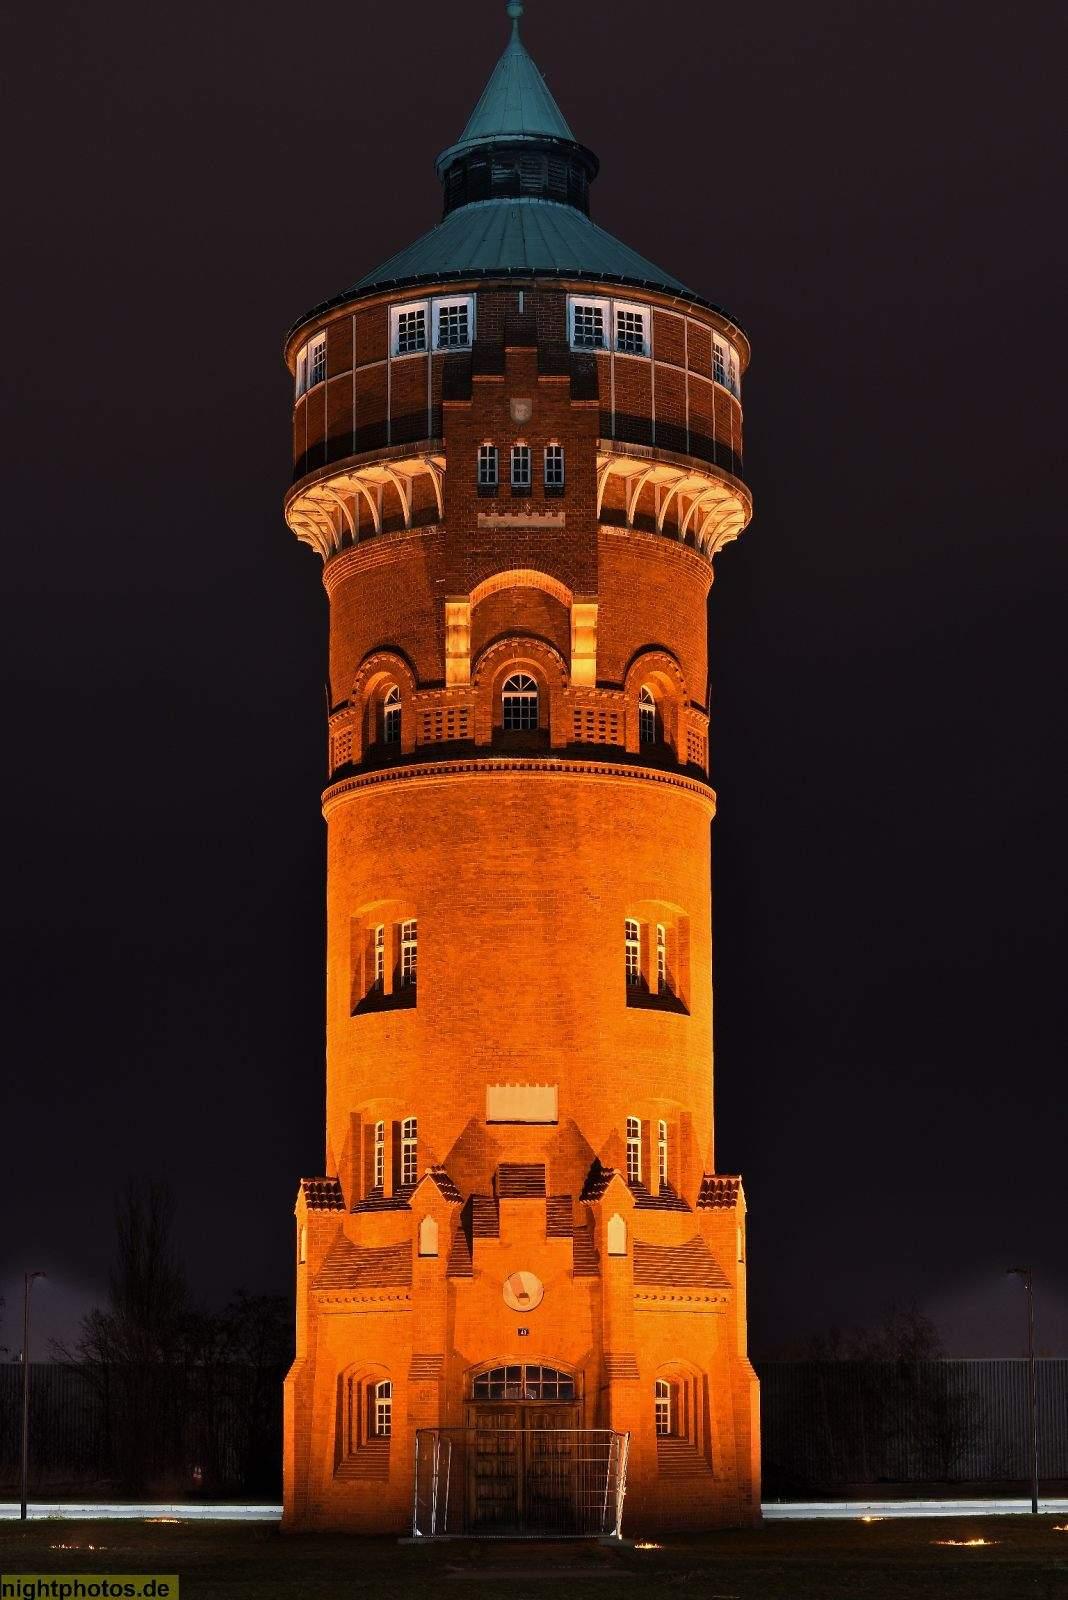 NP 2017 03 03 06 Berlin Tempelhof Marienpark ehem Gaswerk Mariendorf erb 1900 1901 alter Wasserturm medium large 2x